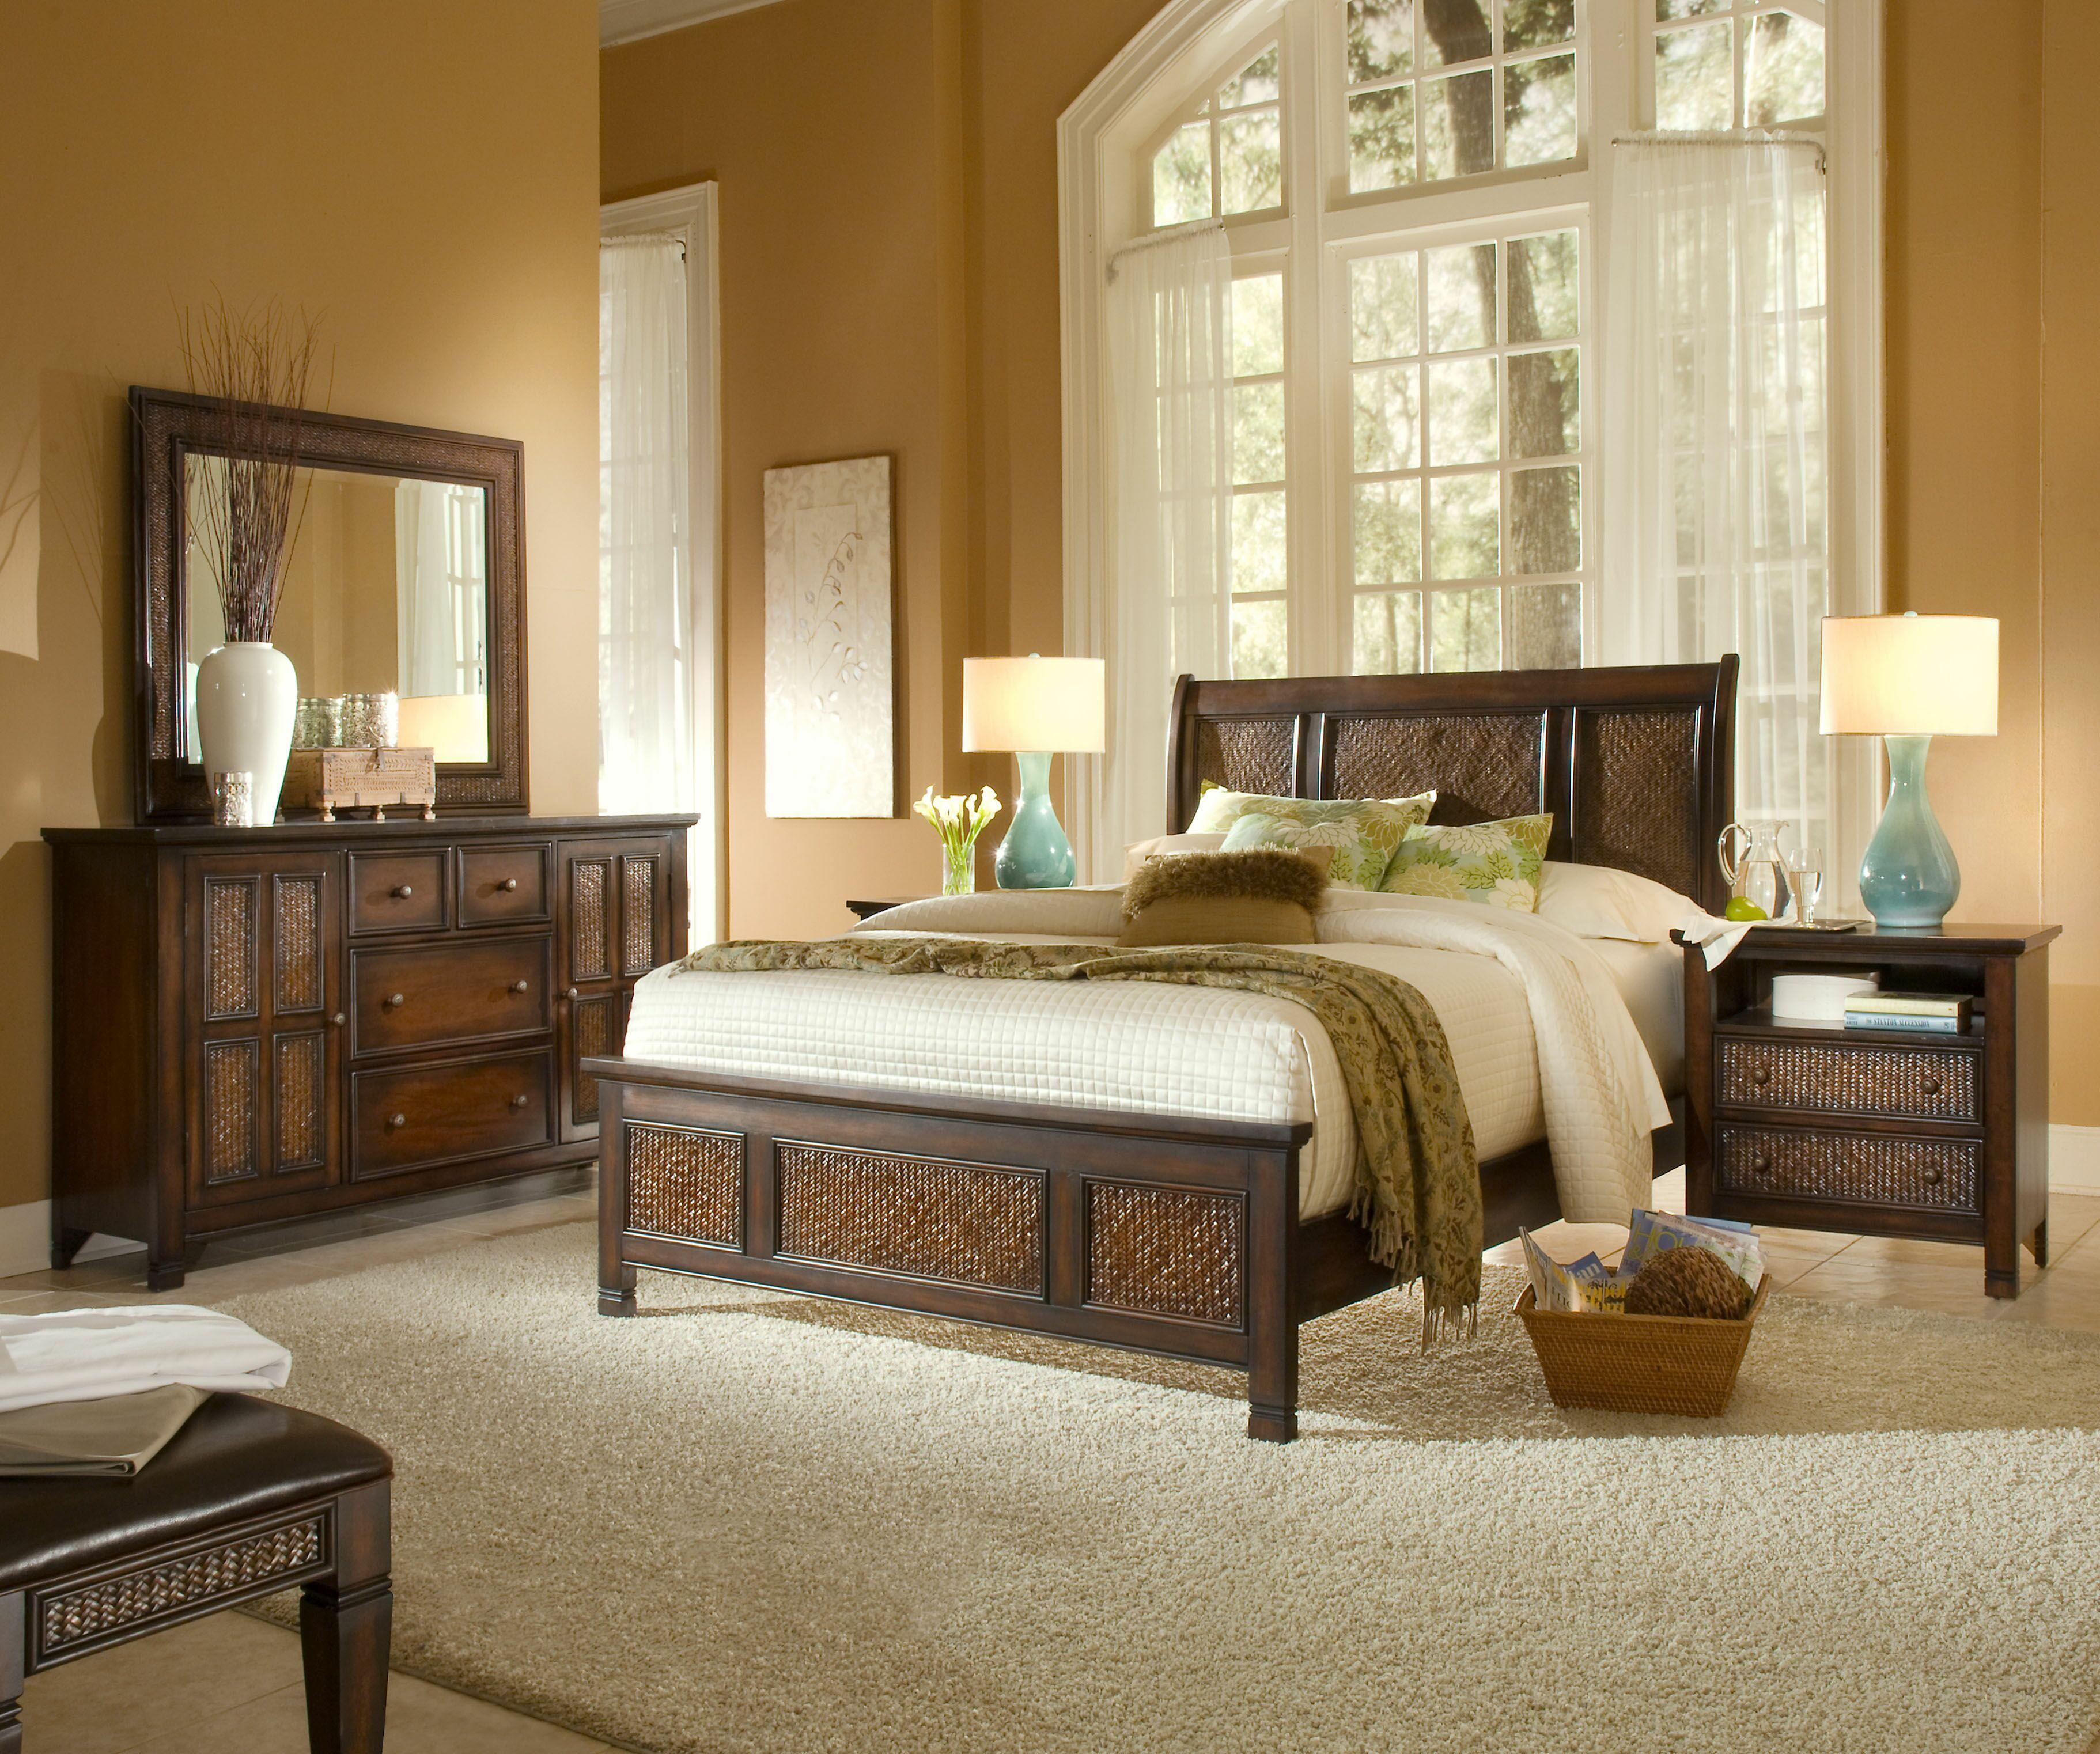 Progressive Furniture Kingston Isle King Bedroom Group 3 - Item Number: P195 K Bedroom Group 3